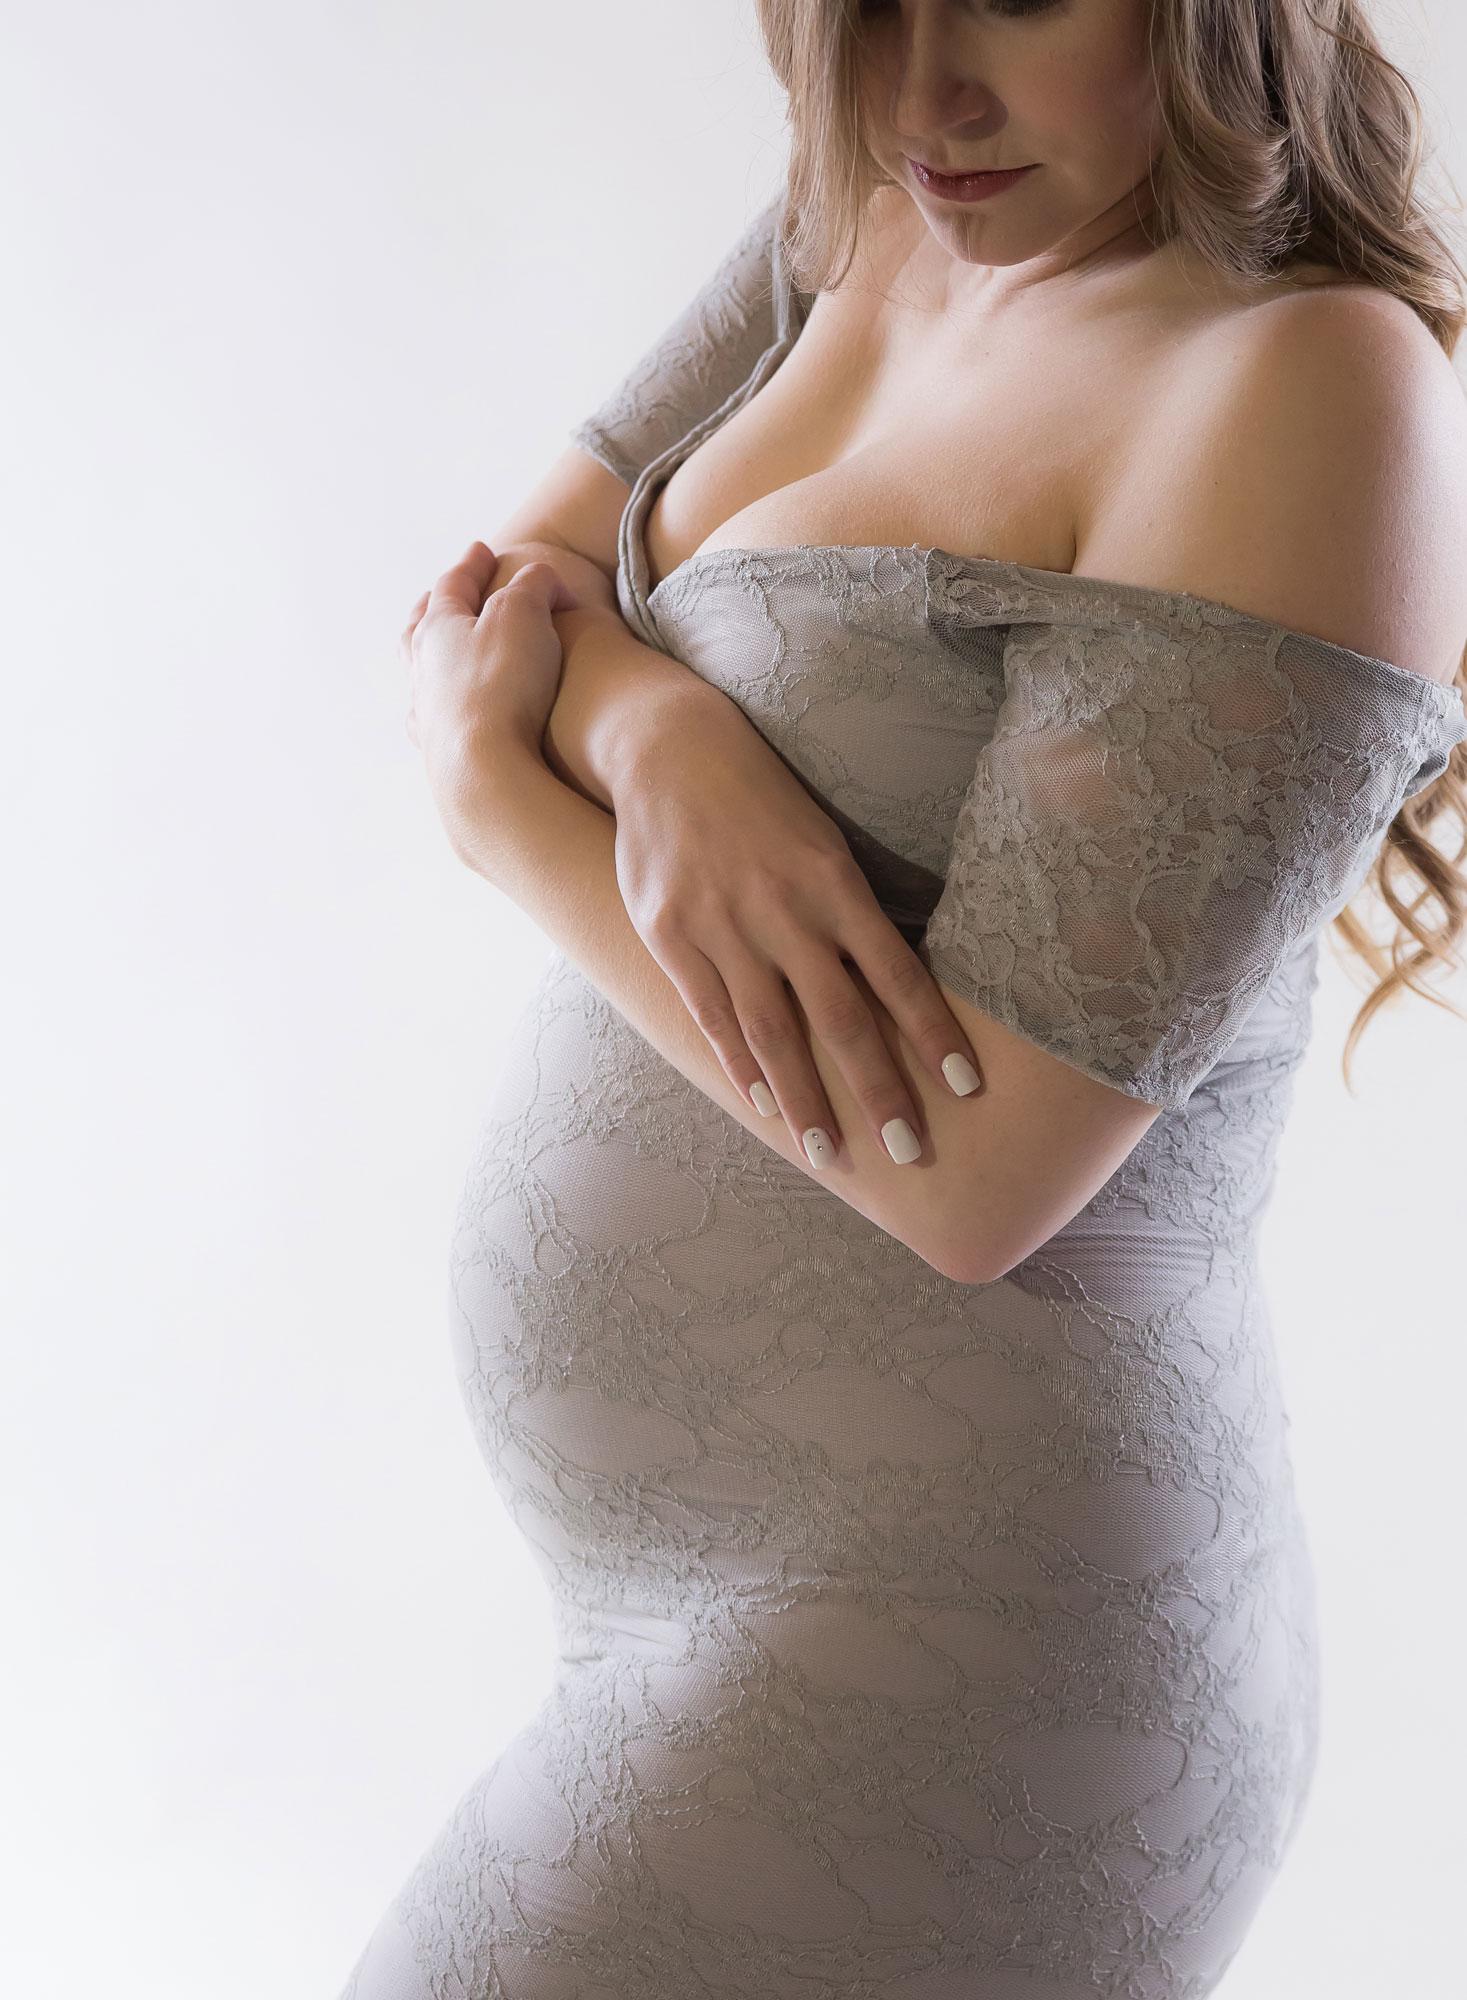 silhouette-maternity-portrait-grey-dress